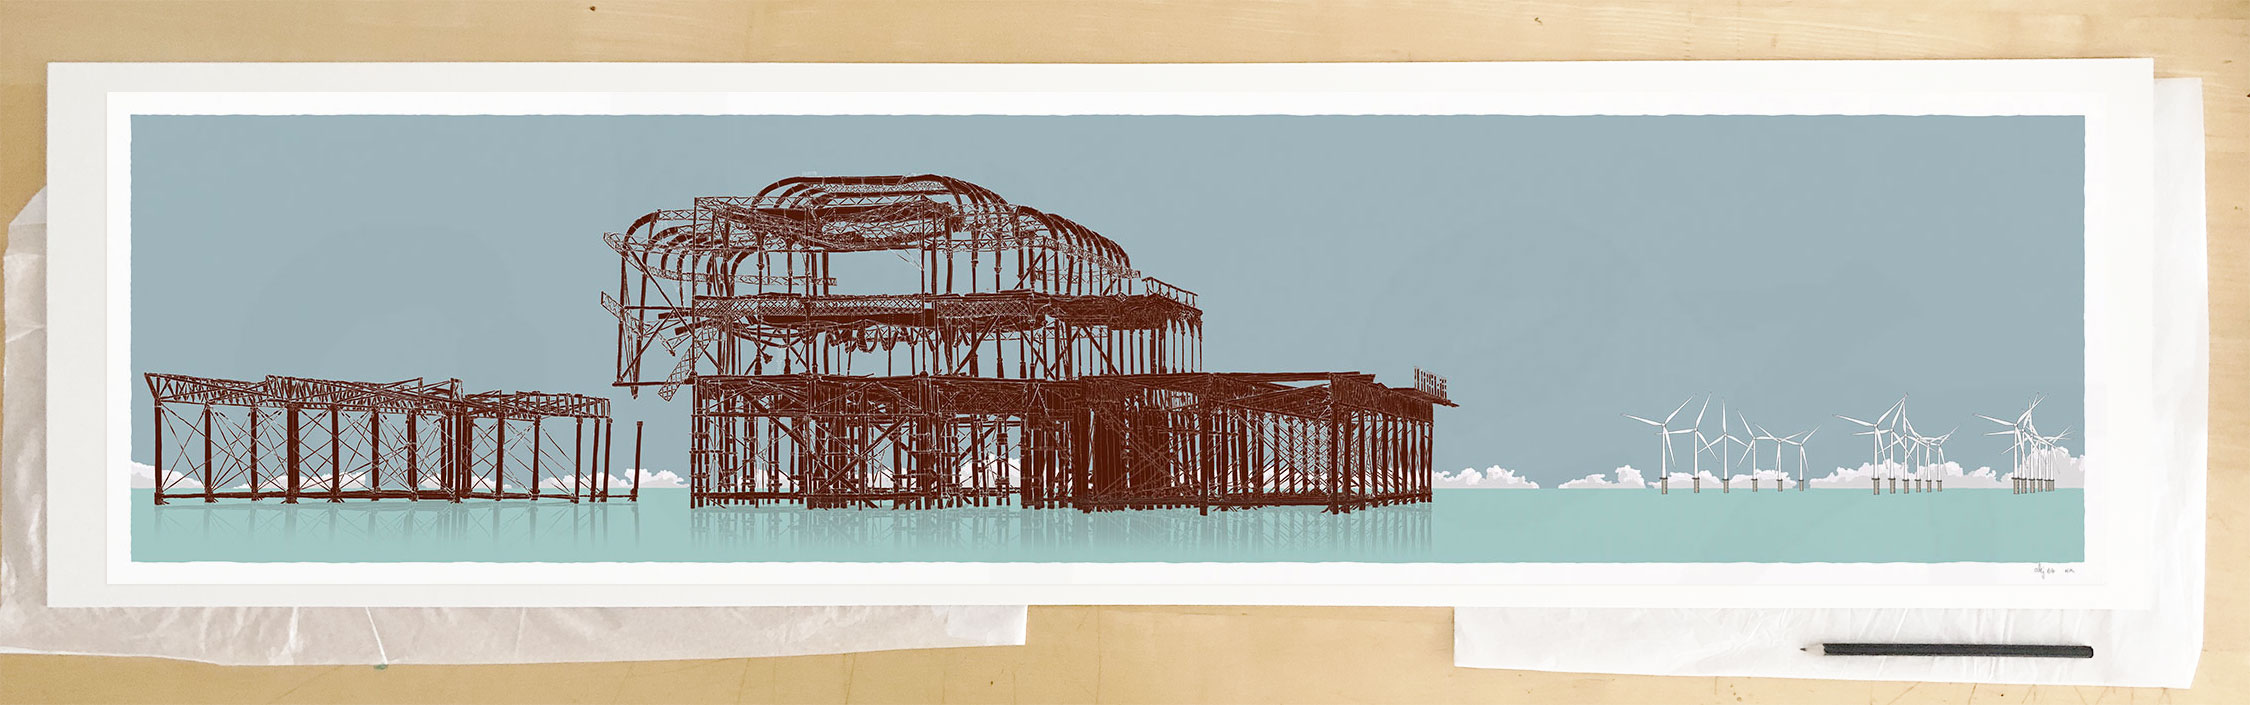 Fine art print by UK artist alej ez titled West Pier Rampion Wind Farm Rusted Irons